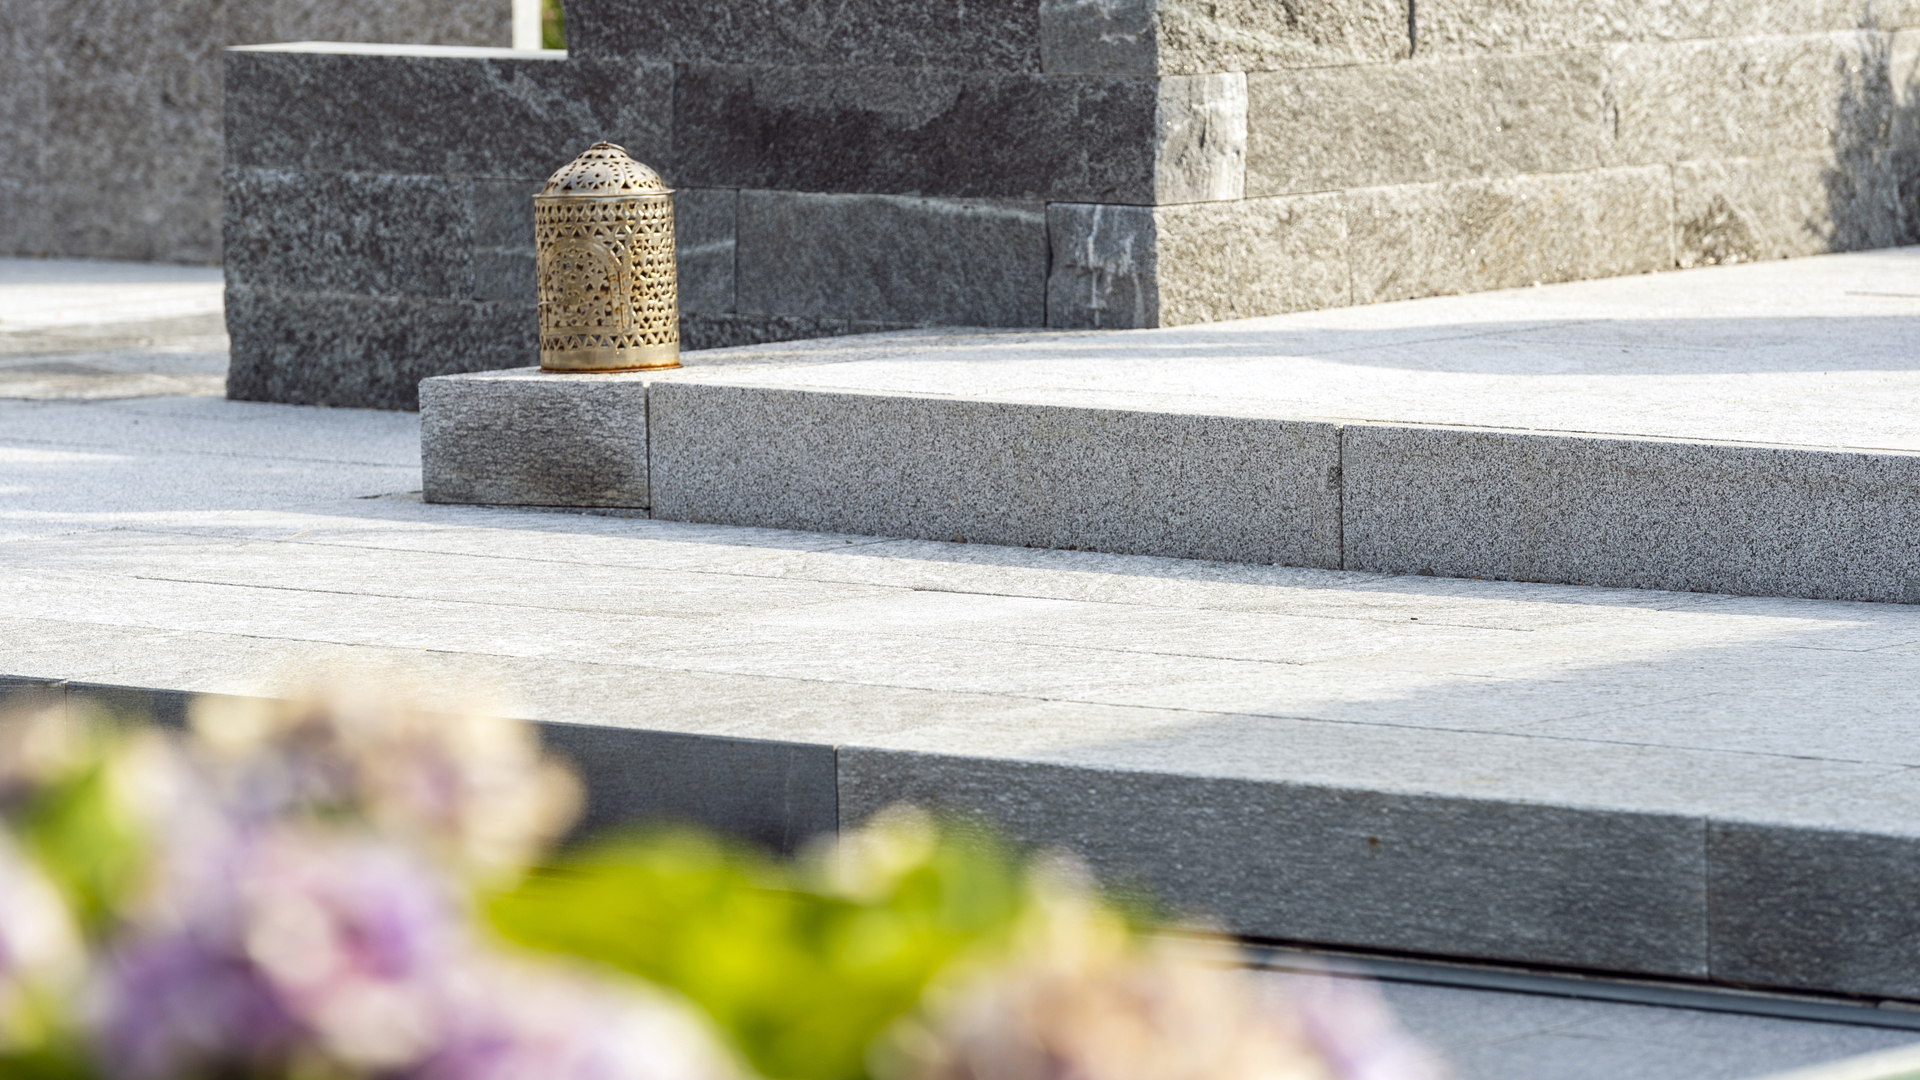 Gartenausstellung Nänikon - Betonplatten,  Pflanzgefässe